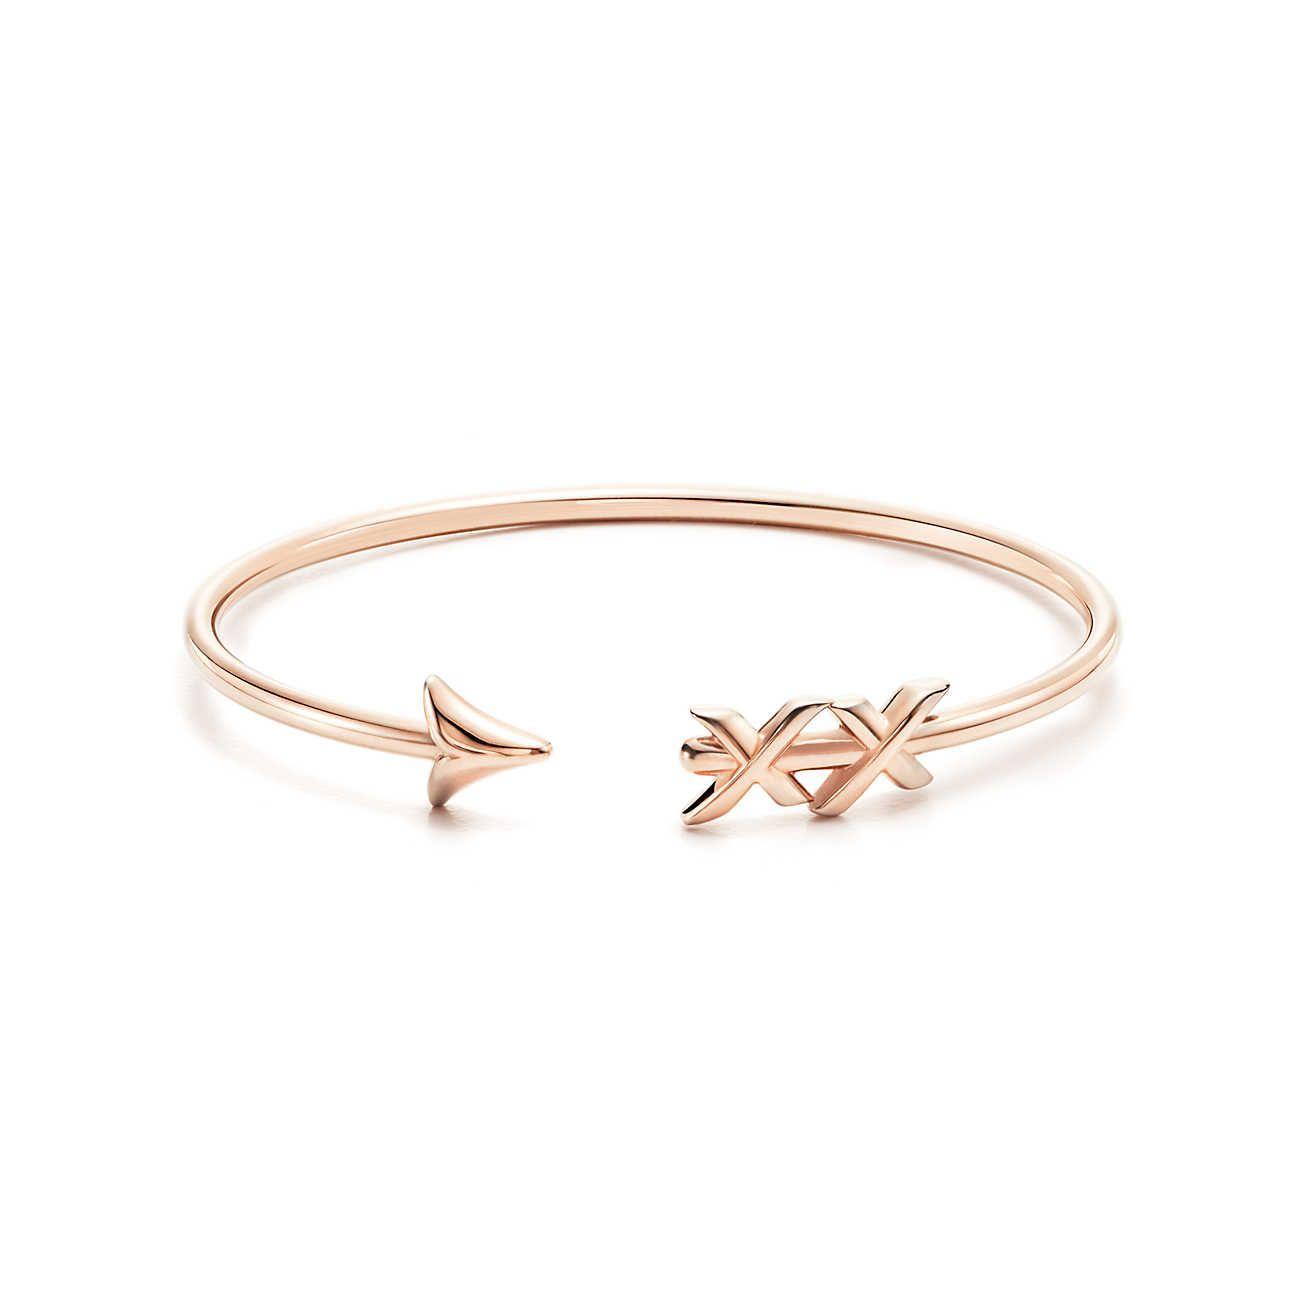 6b0483370 Arrow Cuff | Accessorize It! | Tiffany bracelets, Arrow bracelet ...